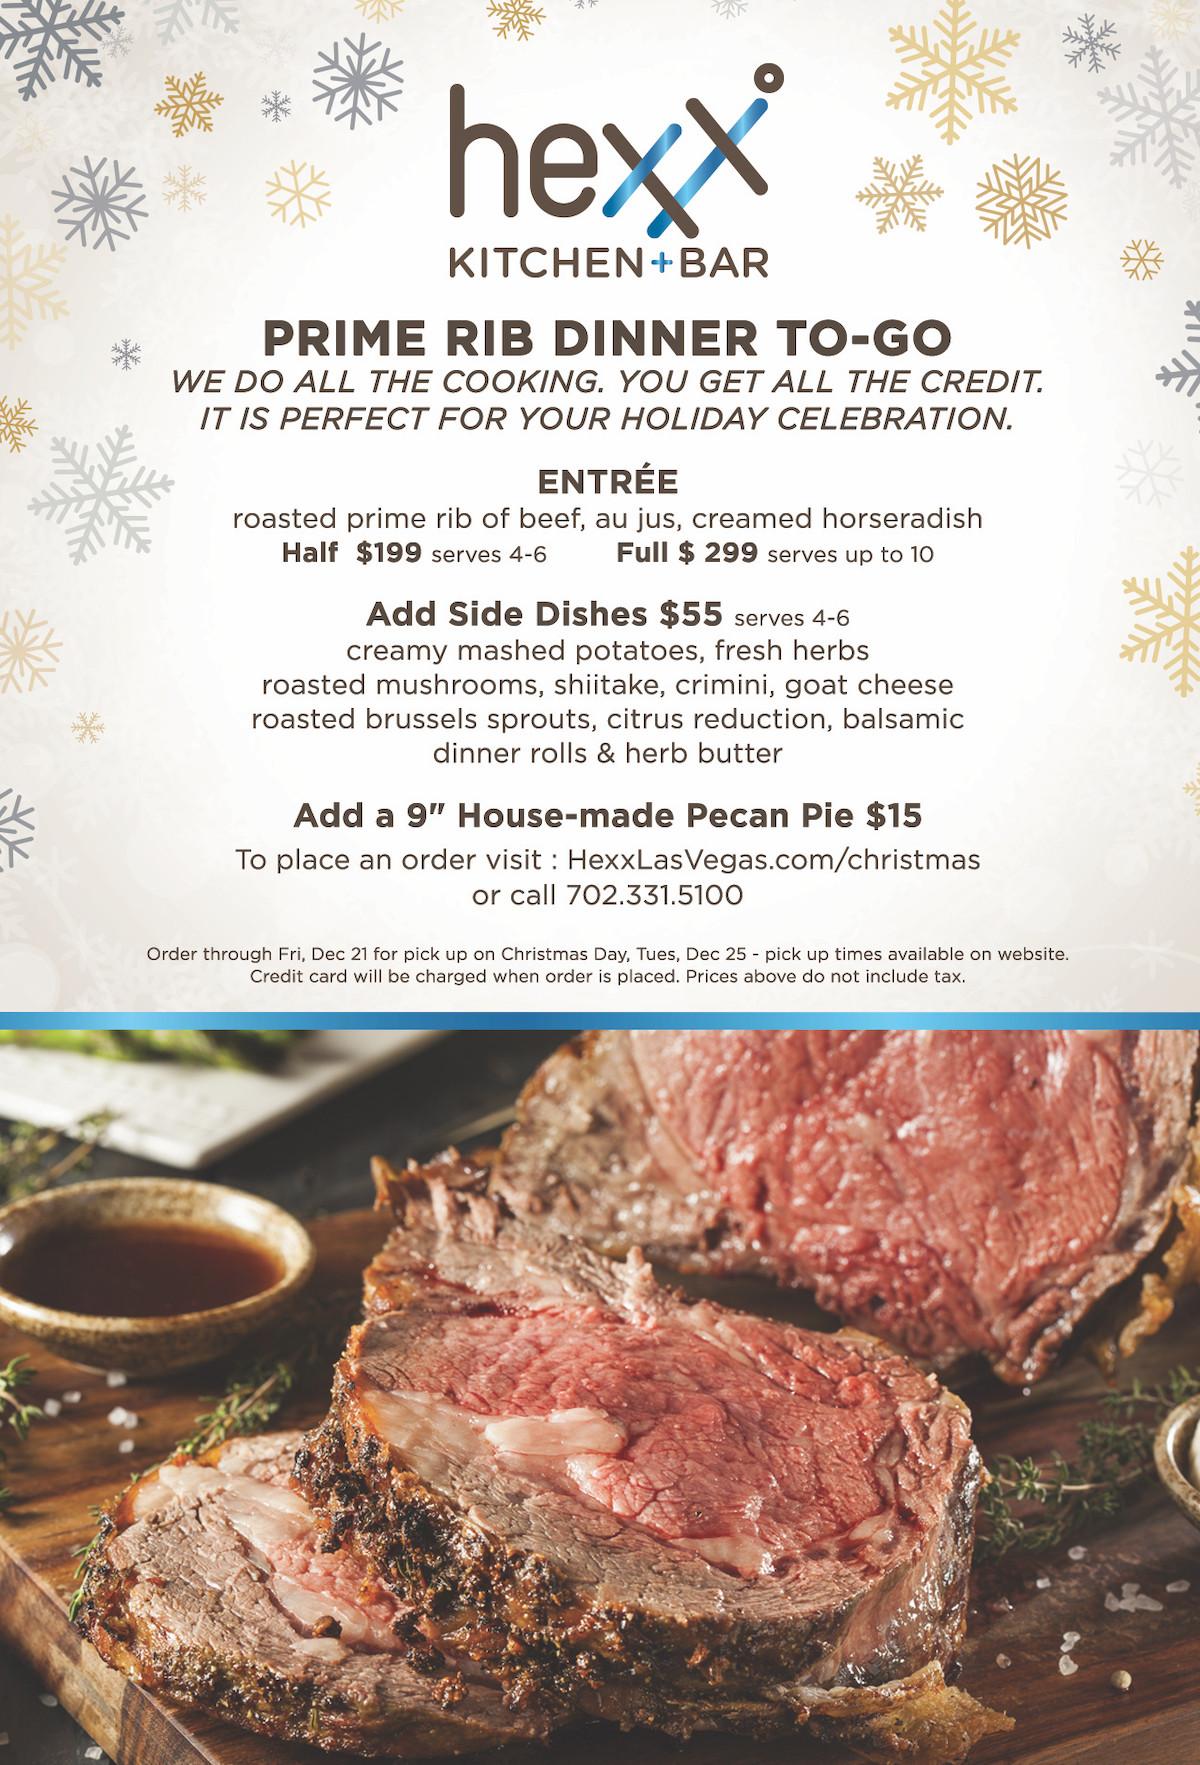 Prime Rib Christmas Dinner Menus  christmas dinner 2018 HEXX kitchen bar Paris Las